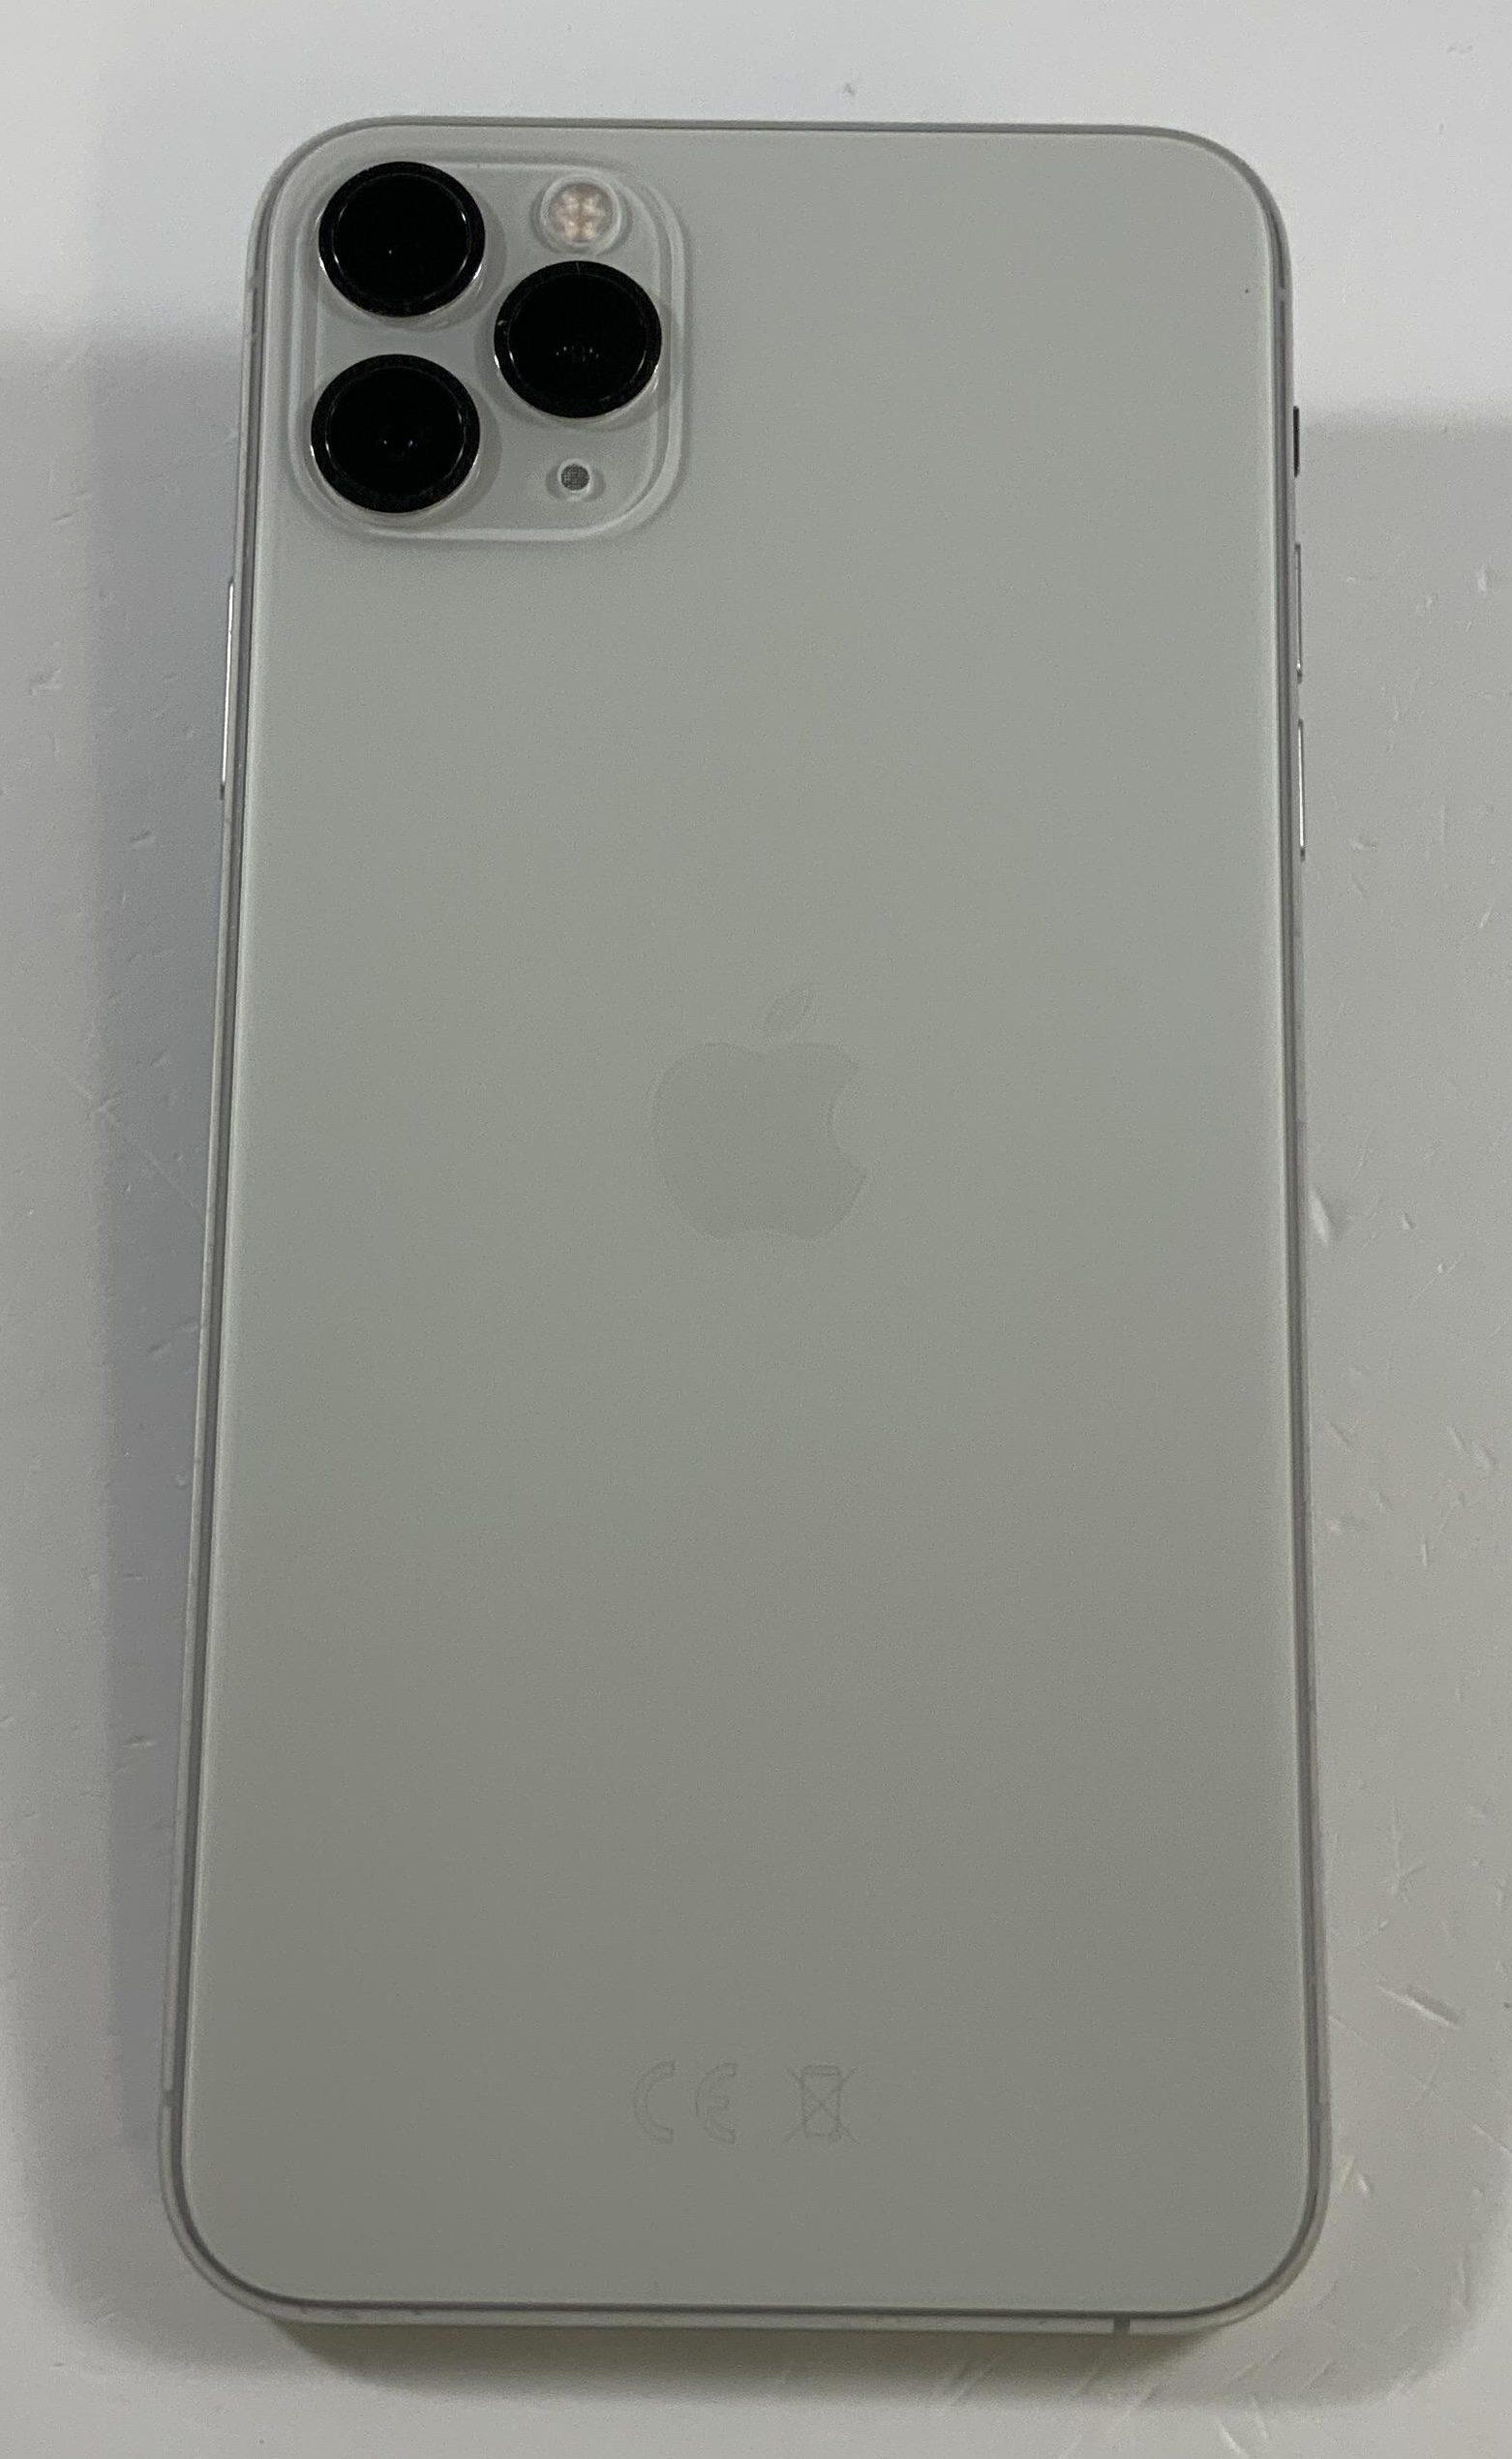 iPhone 11 Pro Max 64GB, 64GB, Silver, image 2